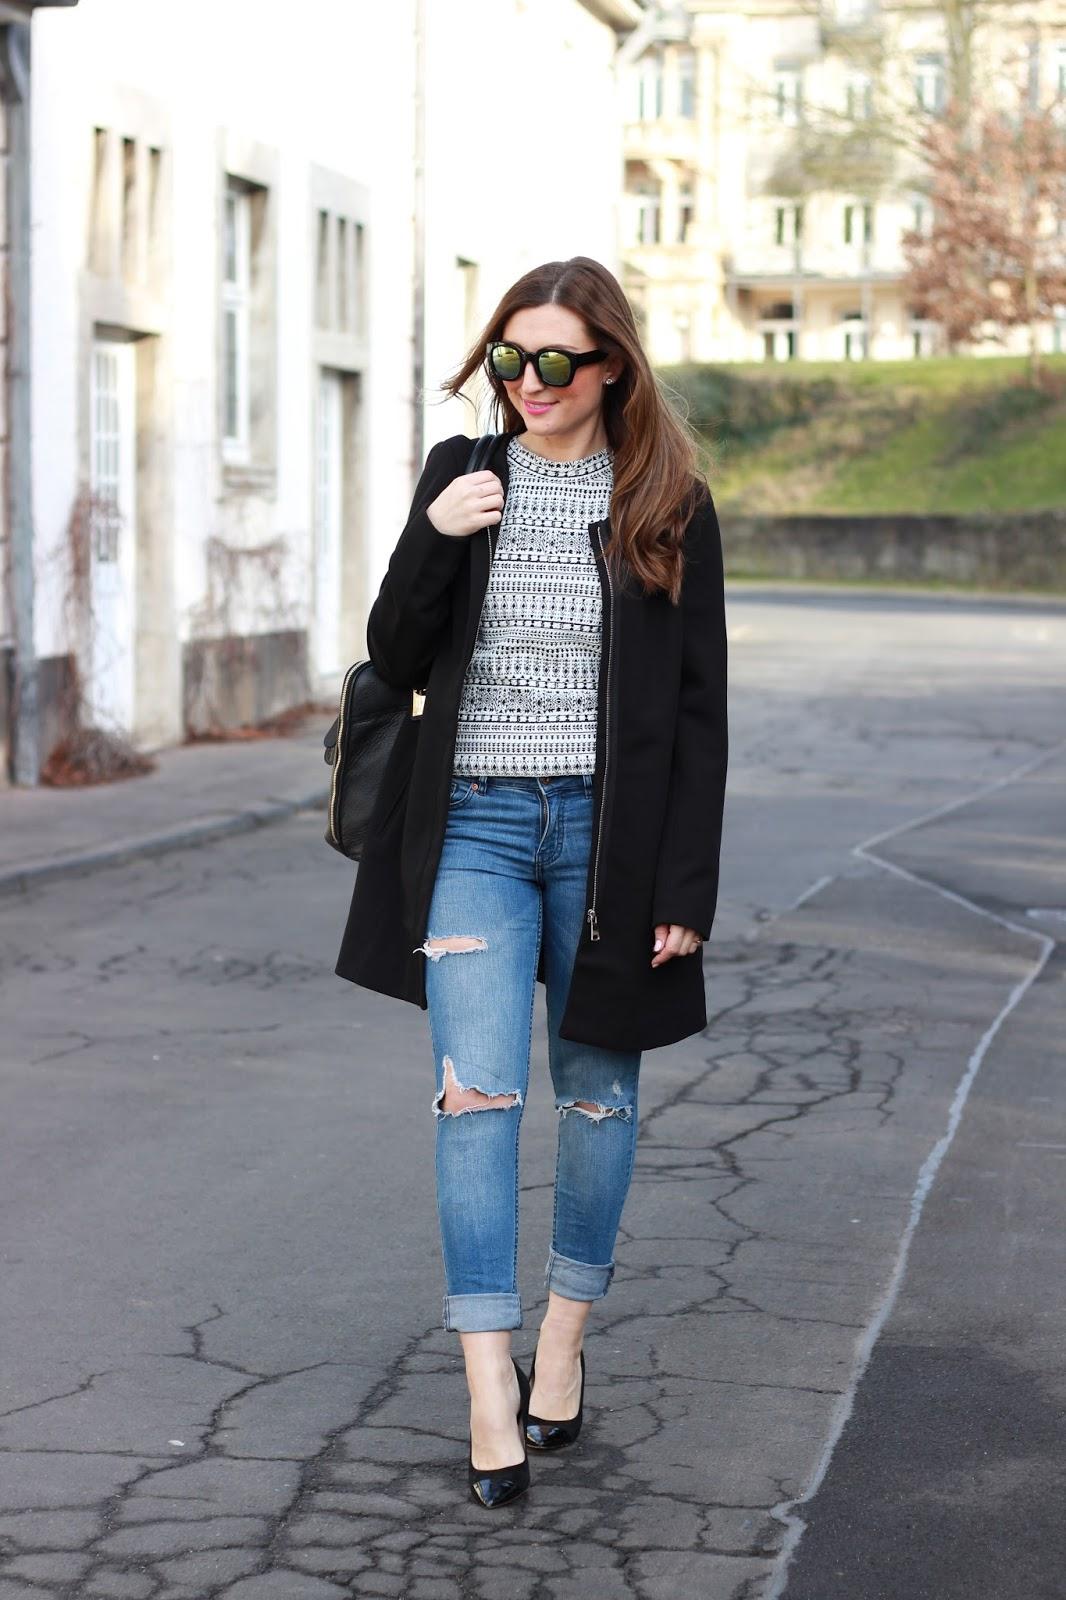 Verspiegelte Sonnenbrille - Verspiegelte Sonnenbrille kombinieren - Schwarzer Mantel Blogger - Tamaris Schuhe